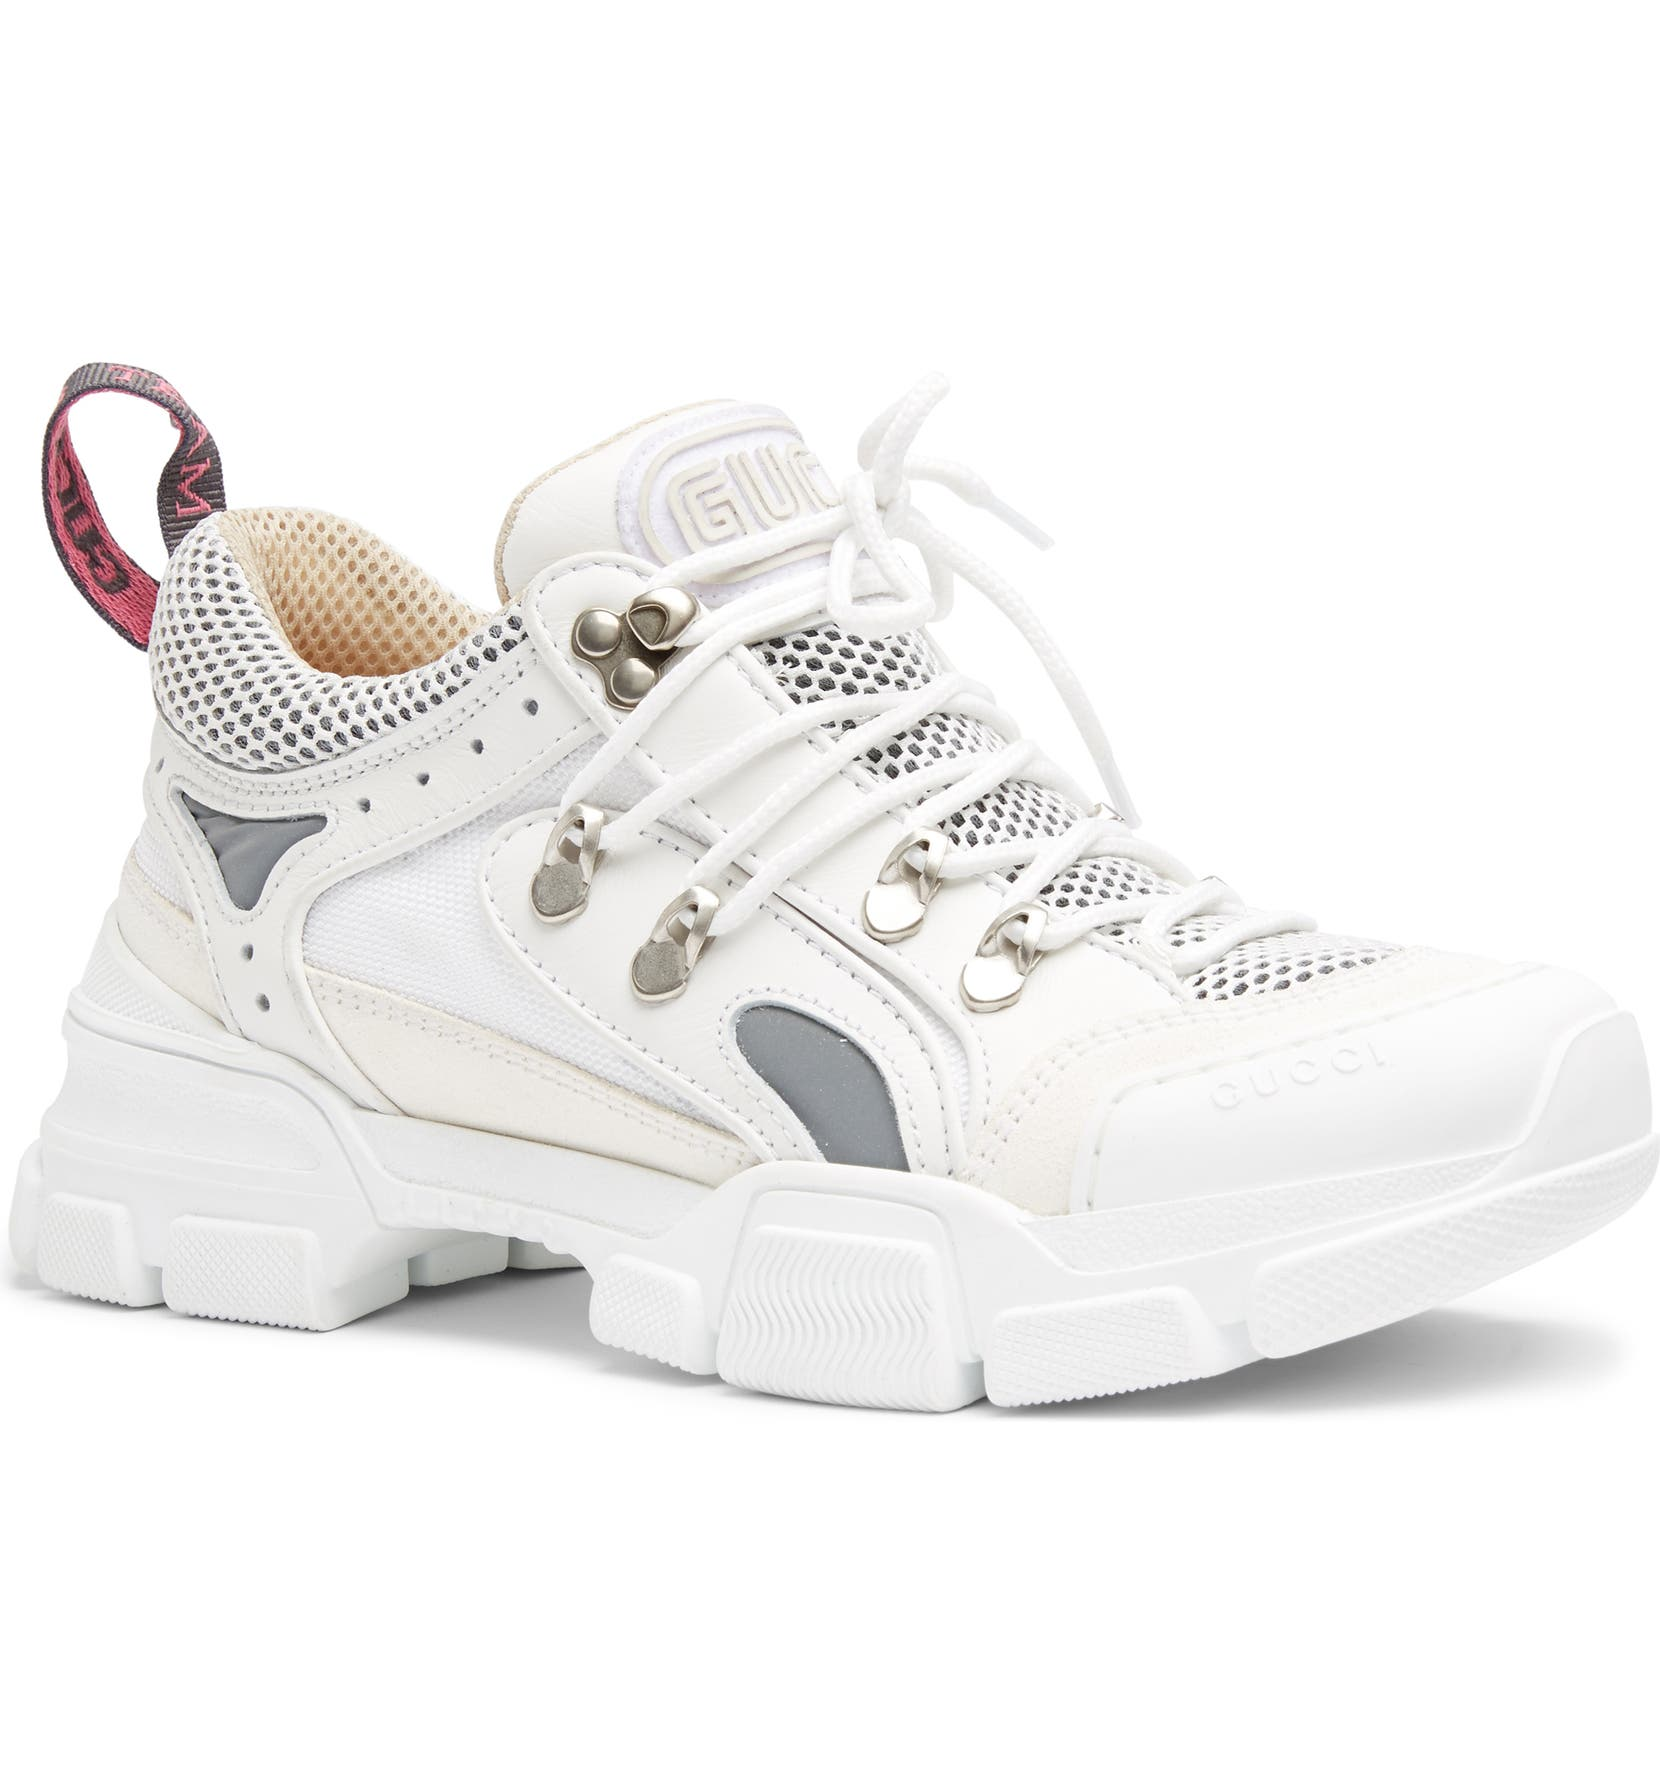 Gucci Flashtrek Sneaker (Women)  9d2e6895b54b